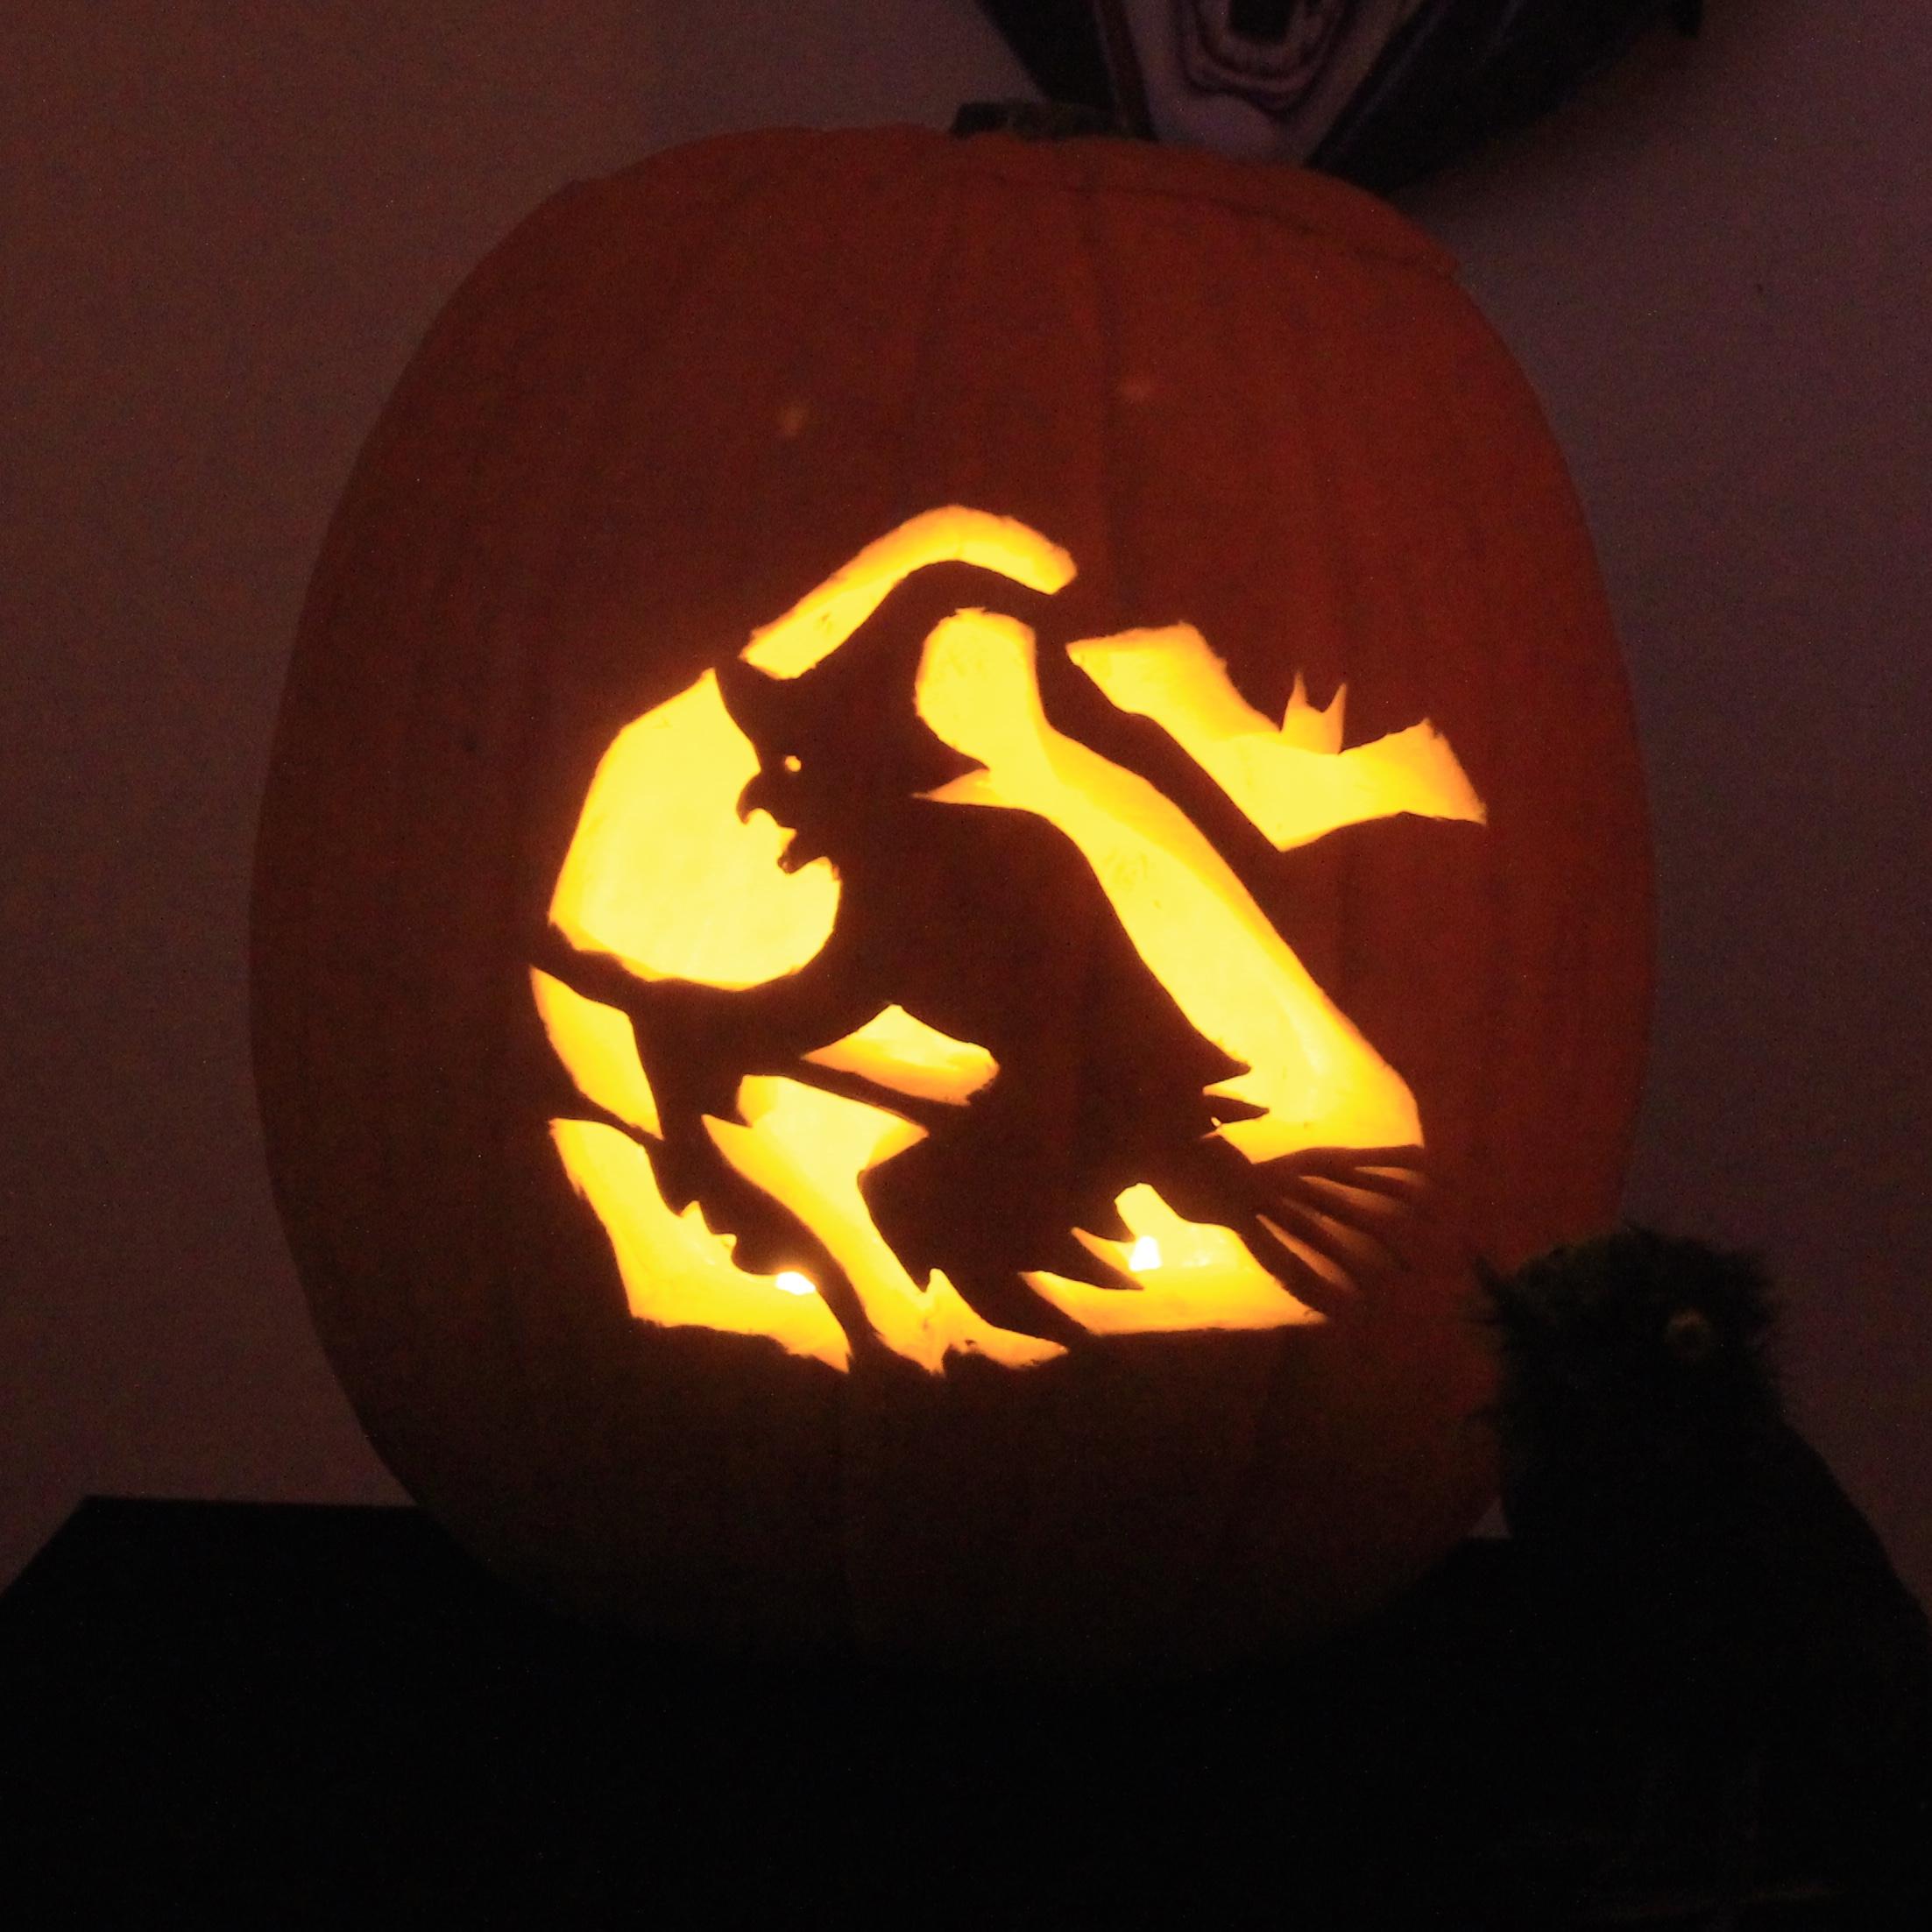 Halloween Witch Jack O'Lantern